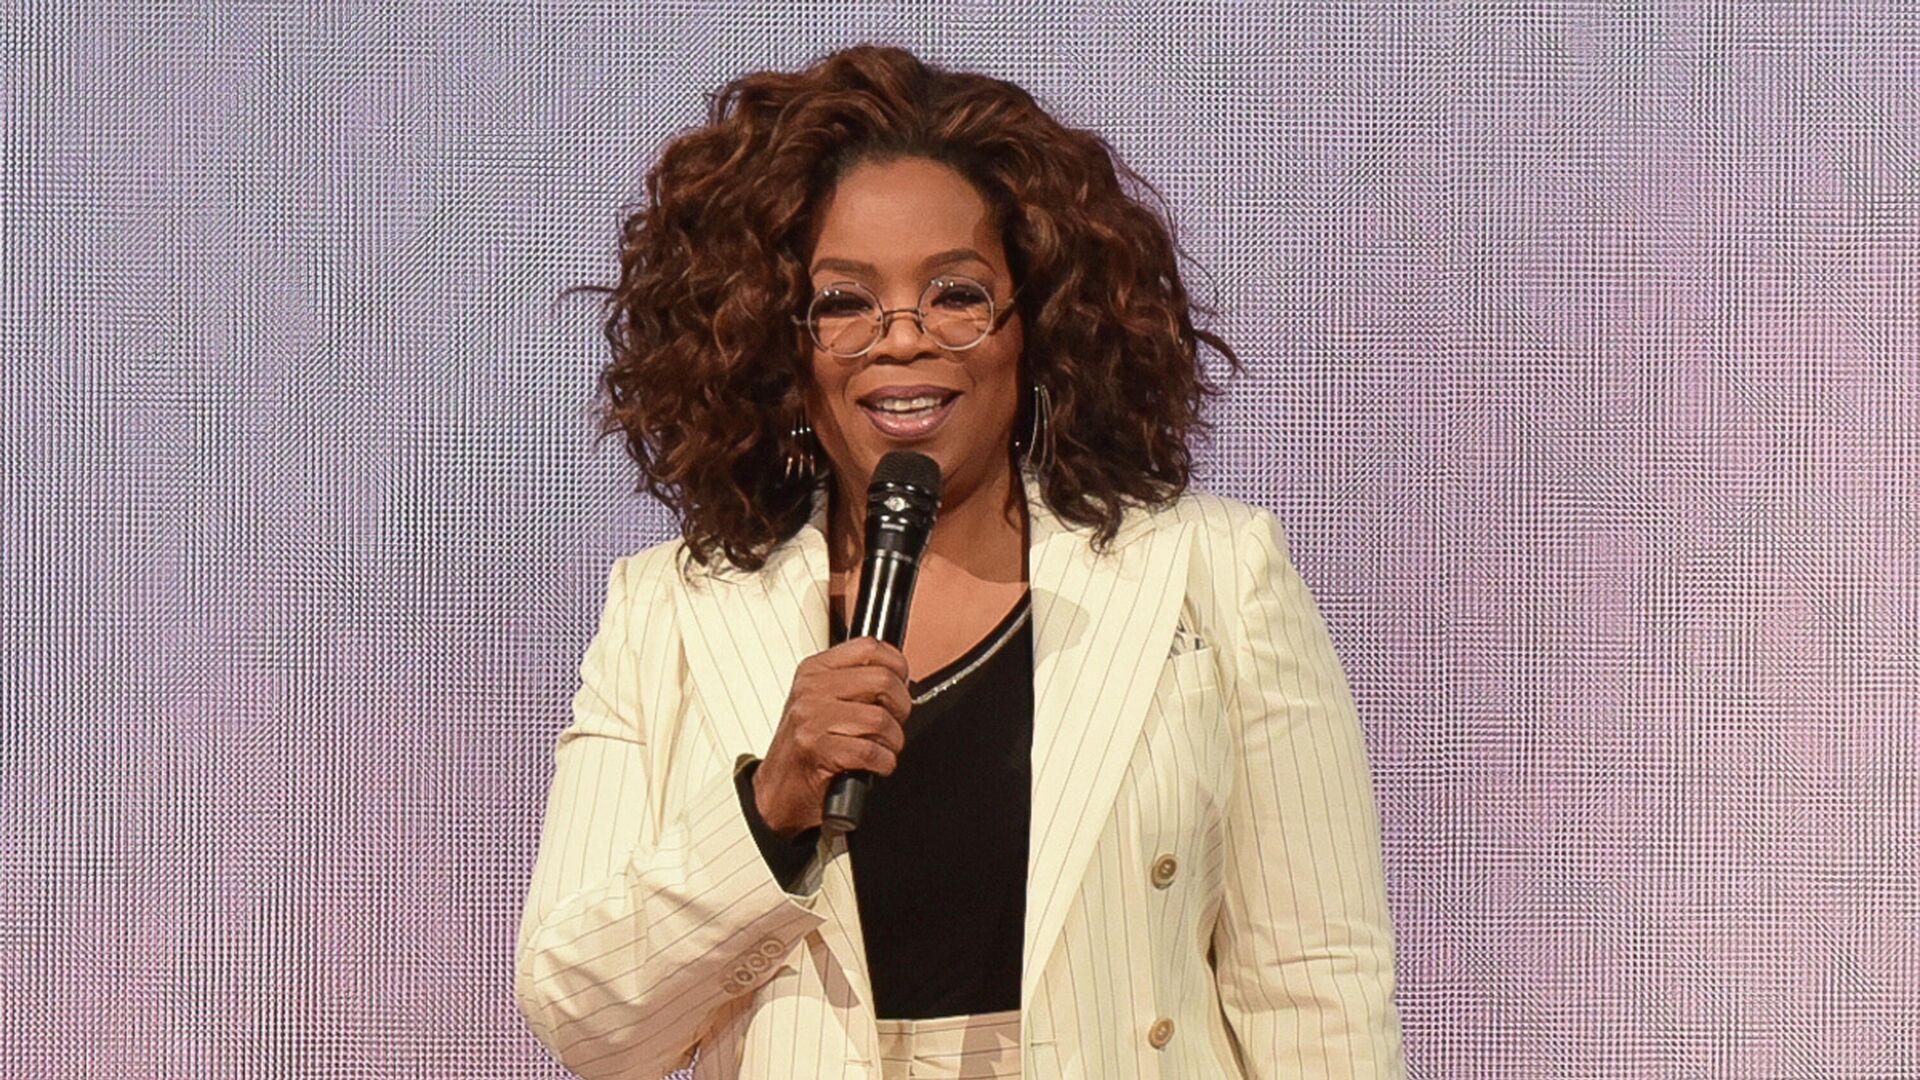 Oprah Winfrey, presentadora estadounidense - Sputnik Mundo, 1920, 24.04.2021